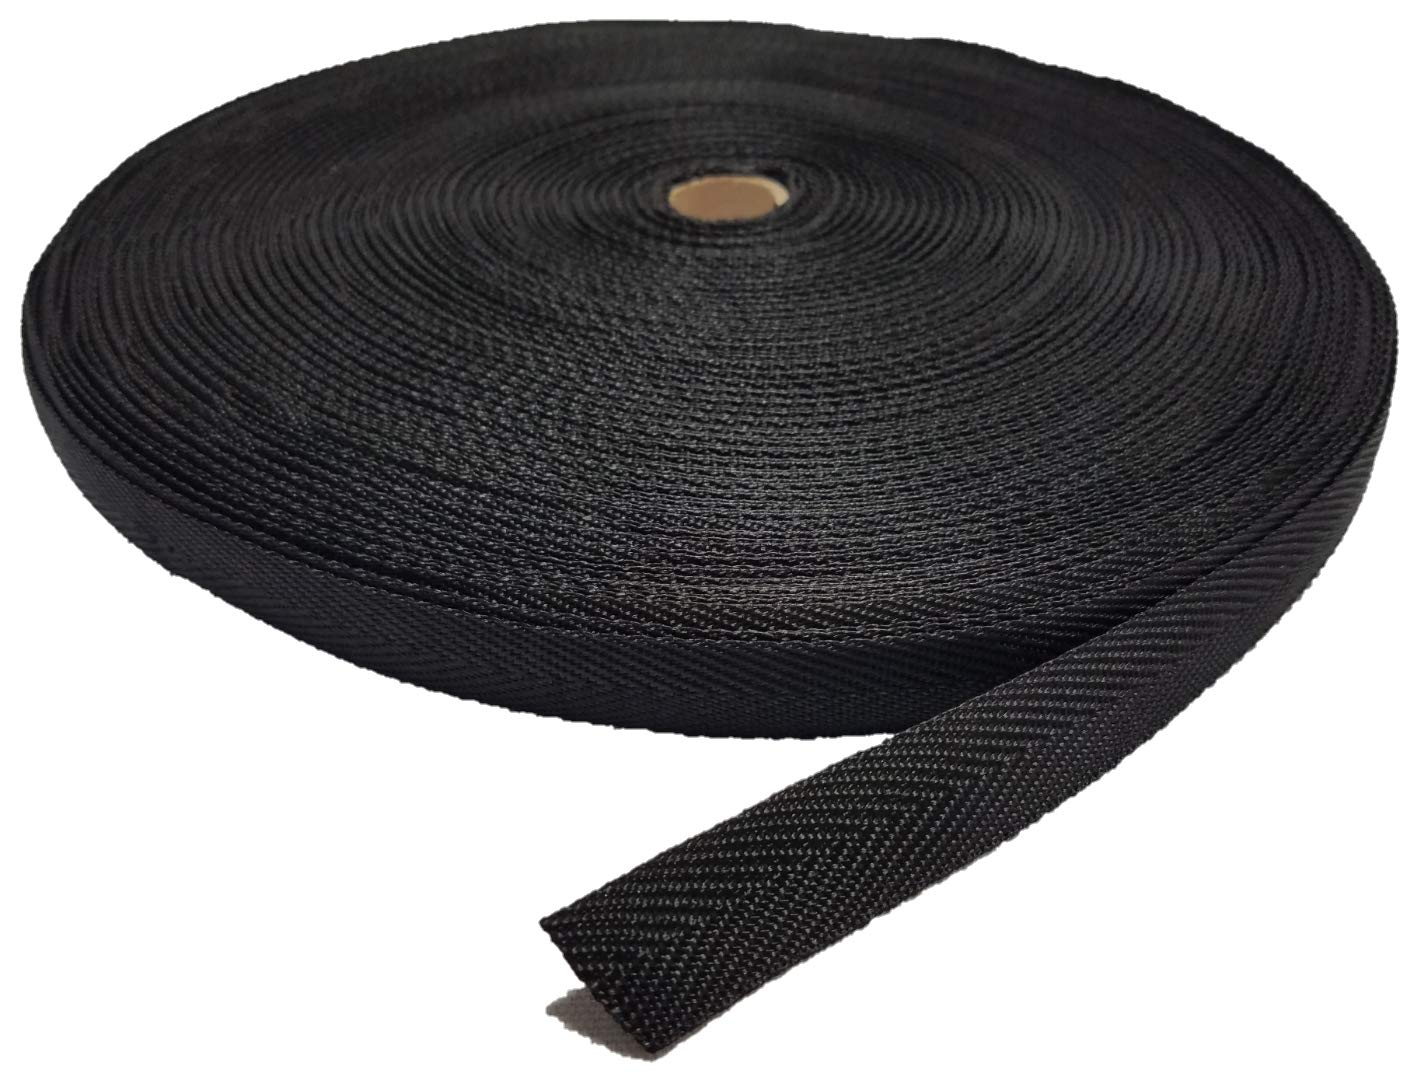 100 YARD - 3/4'' NYLON BINDING TAPE / WEBBING - HERRINGBONE PATTERN - BLACK by Ameratex